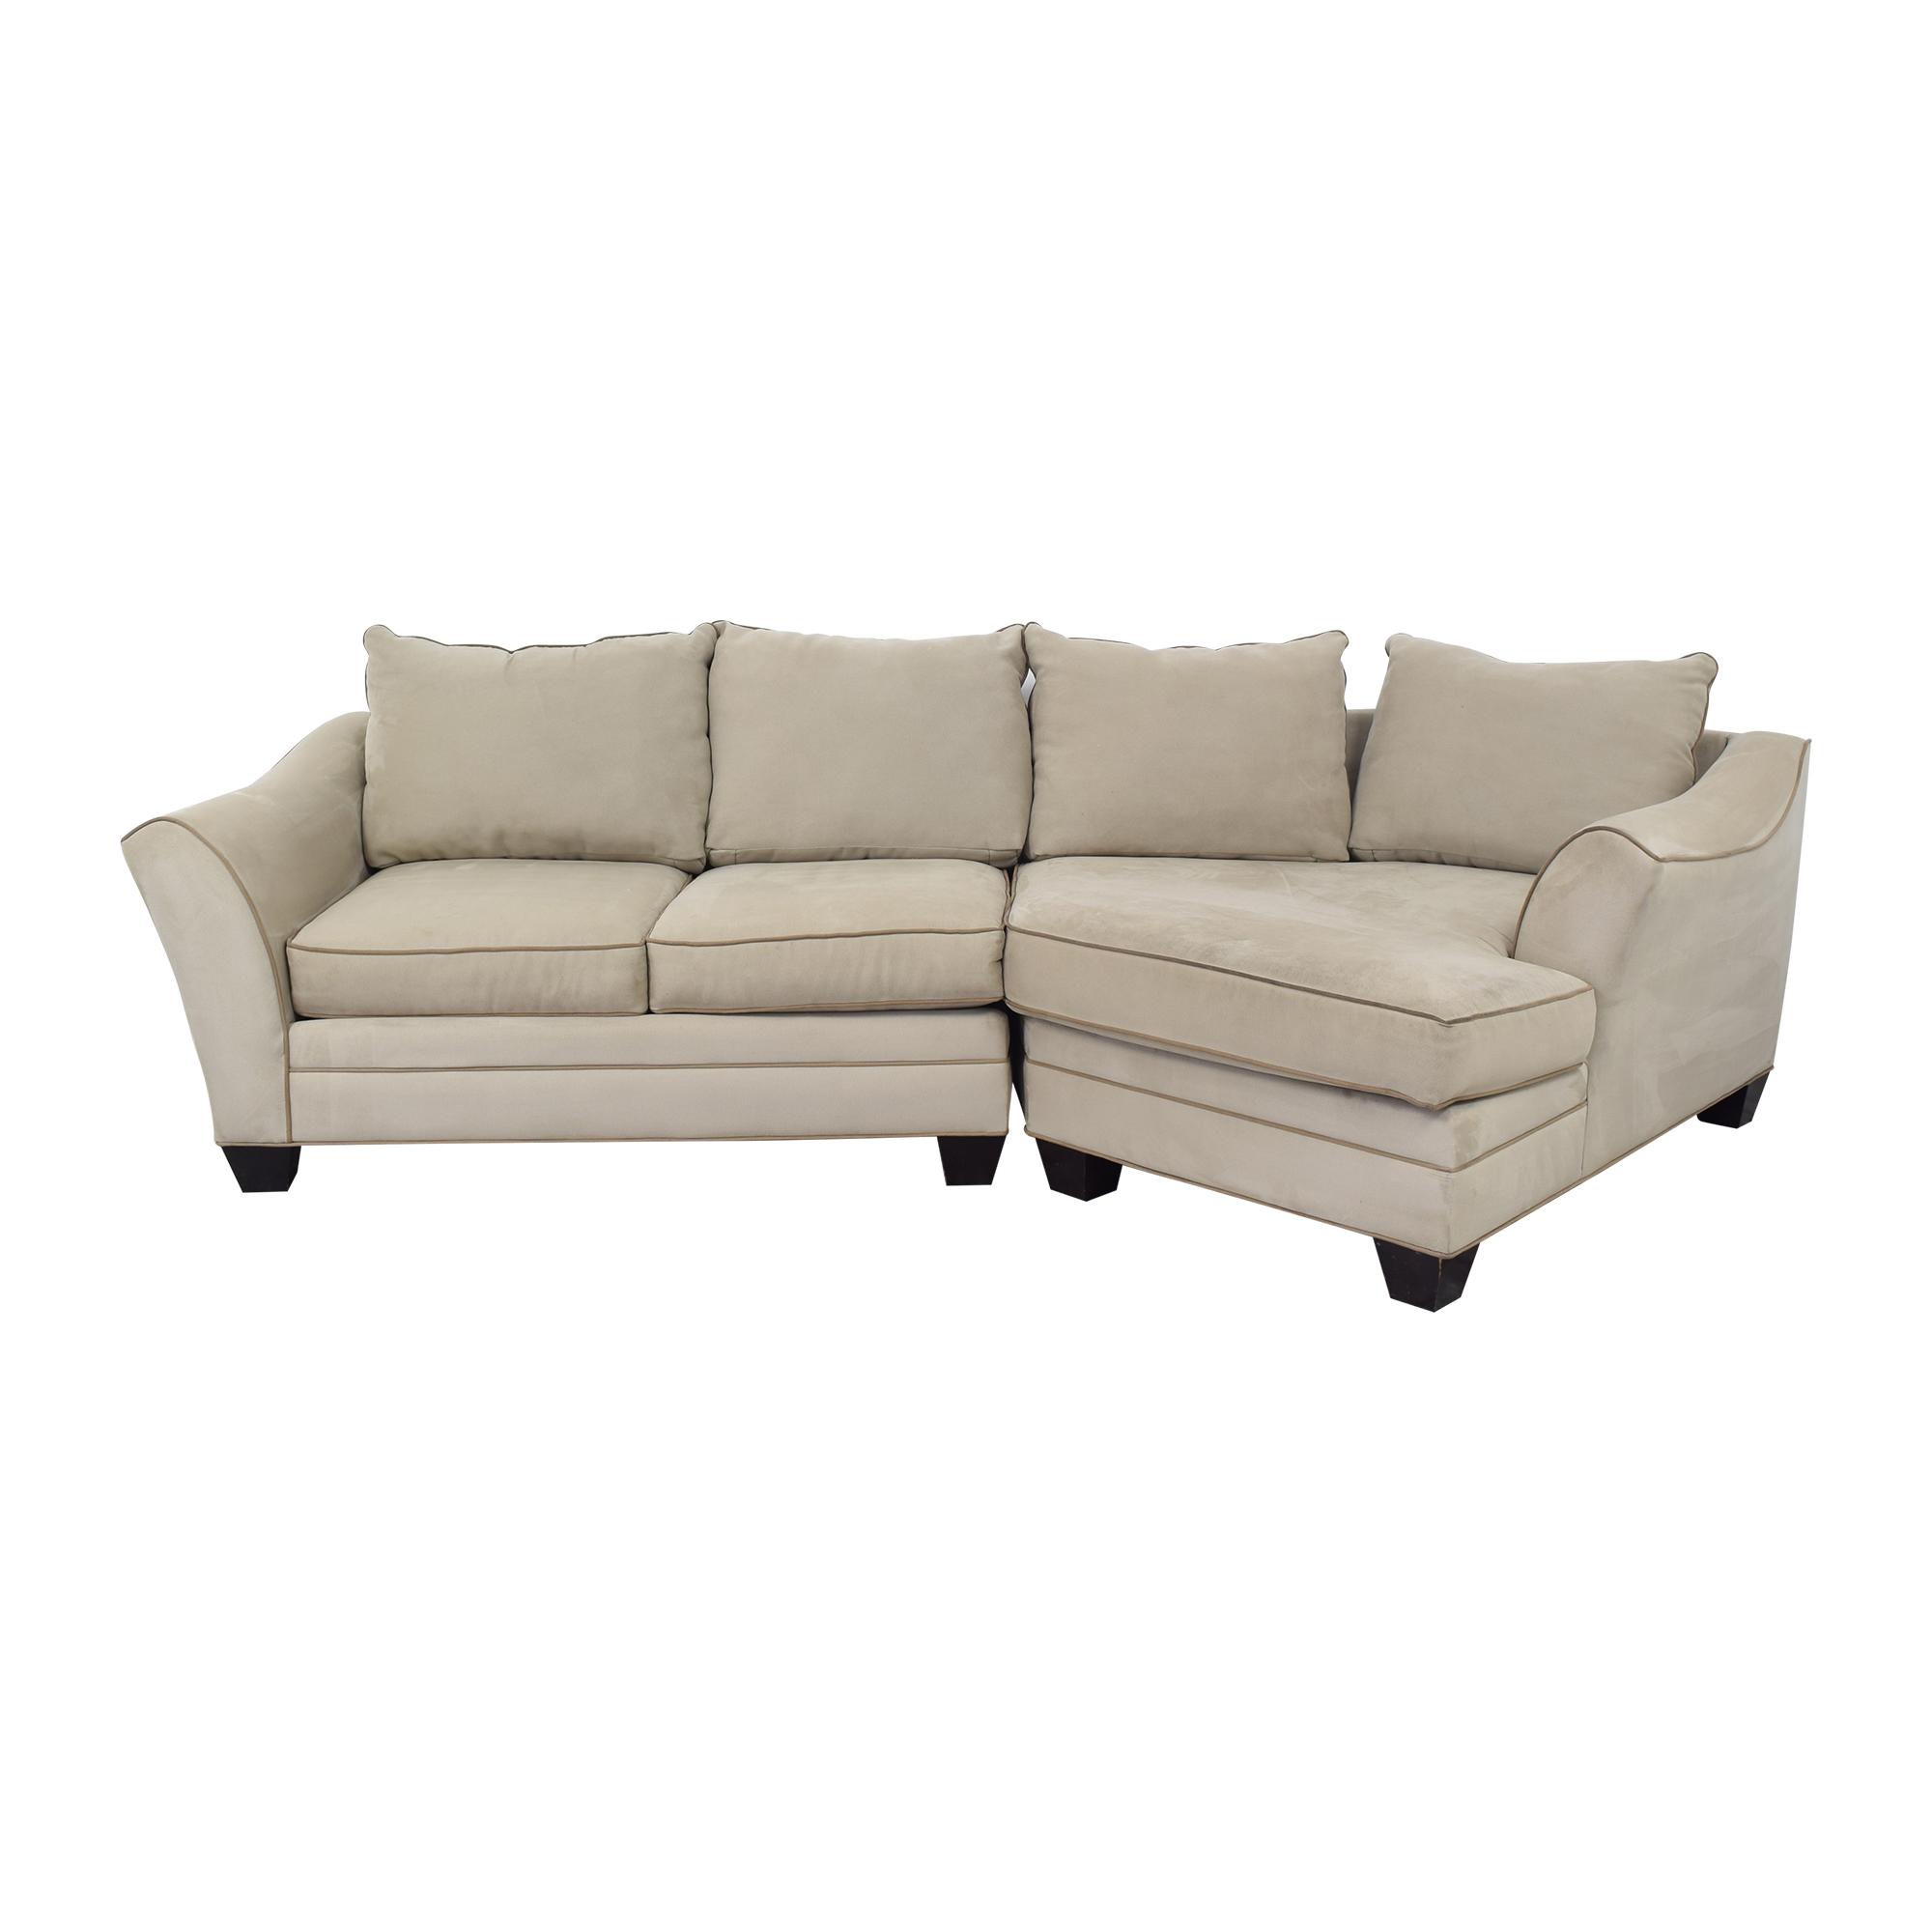 HM Richards Furniture HM Richards Furniture Cuddler Sectional Sofa on sale